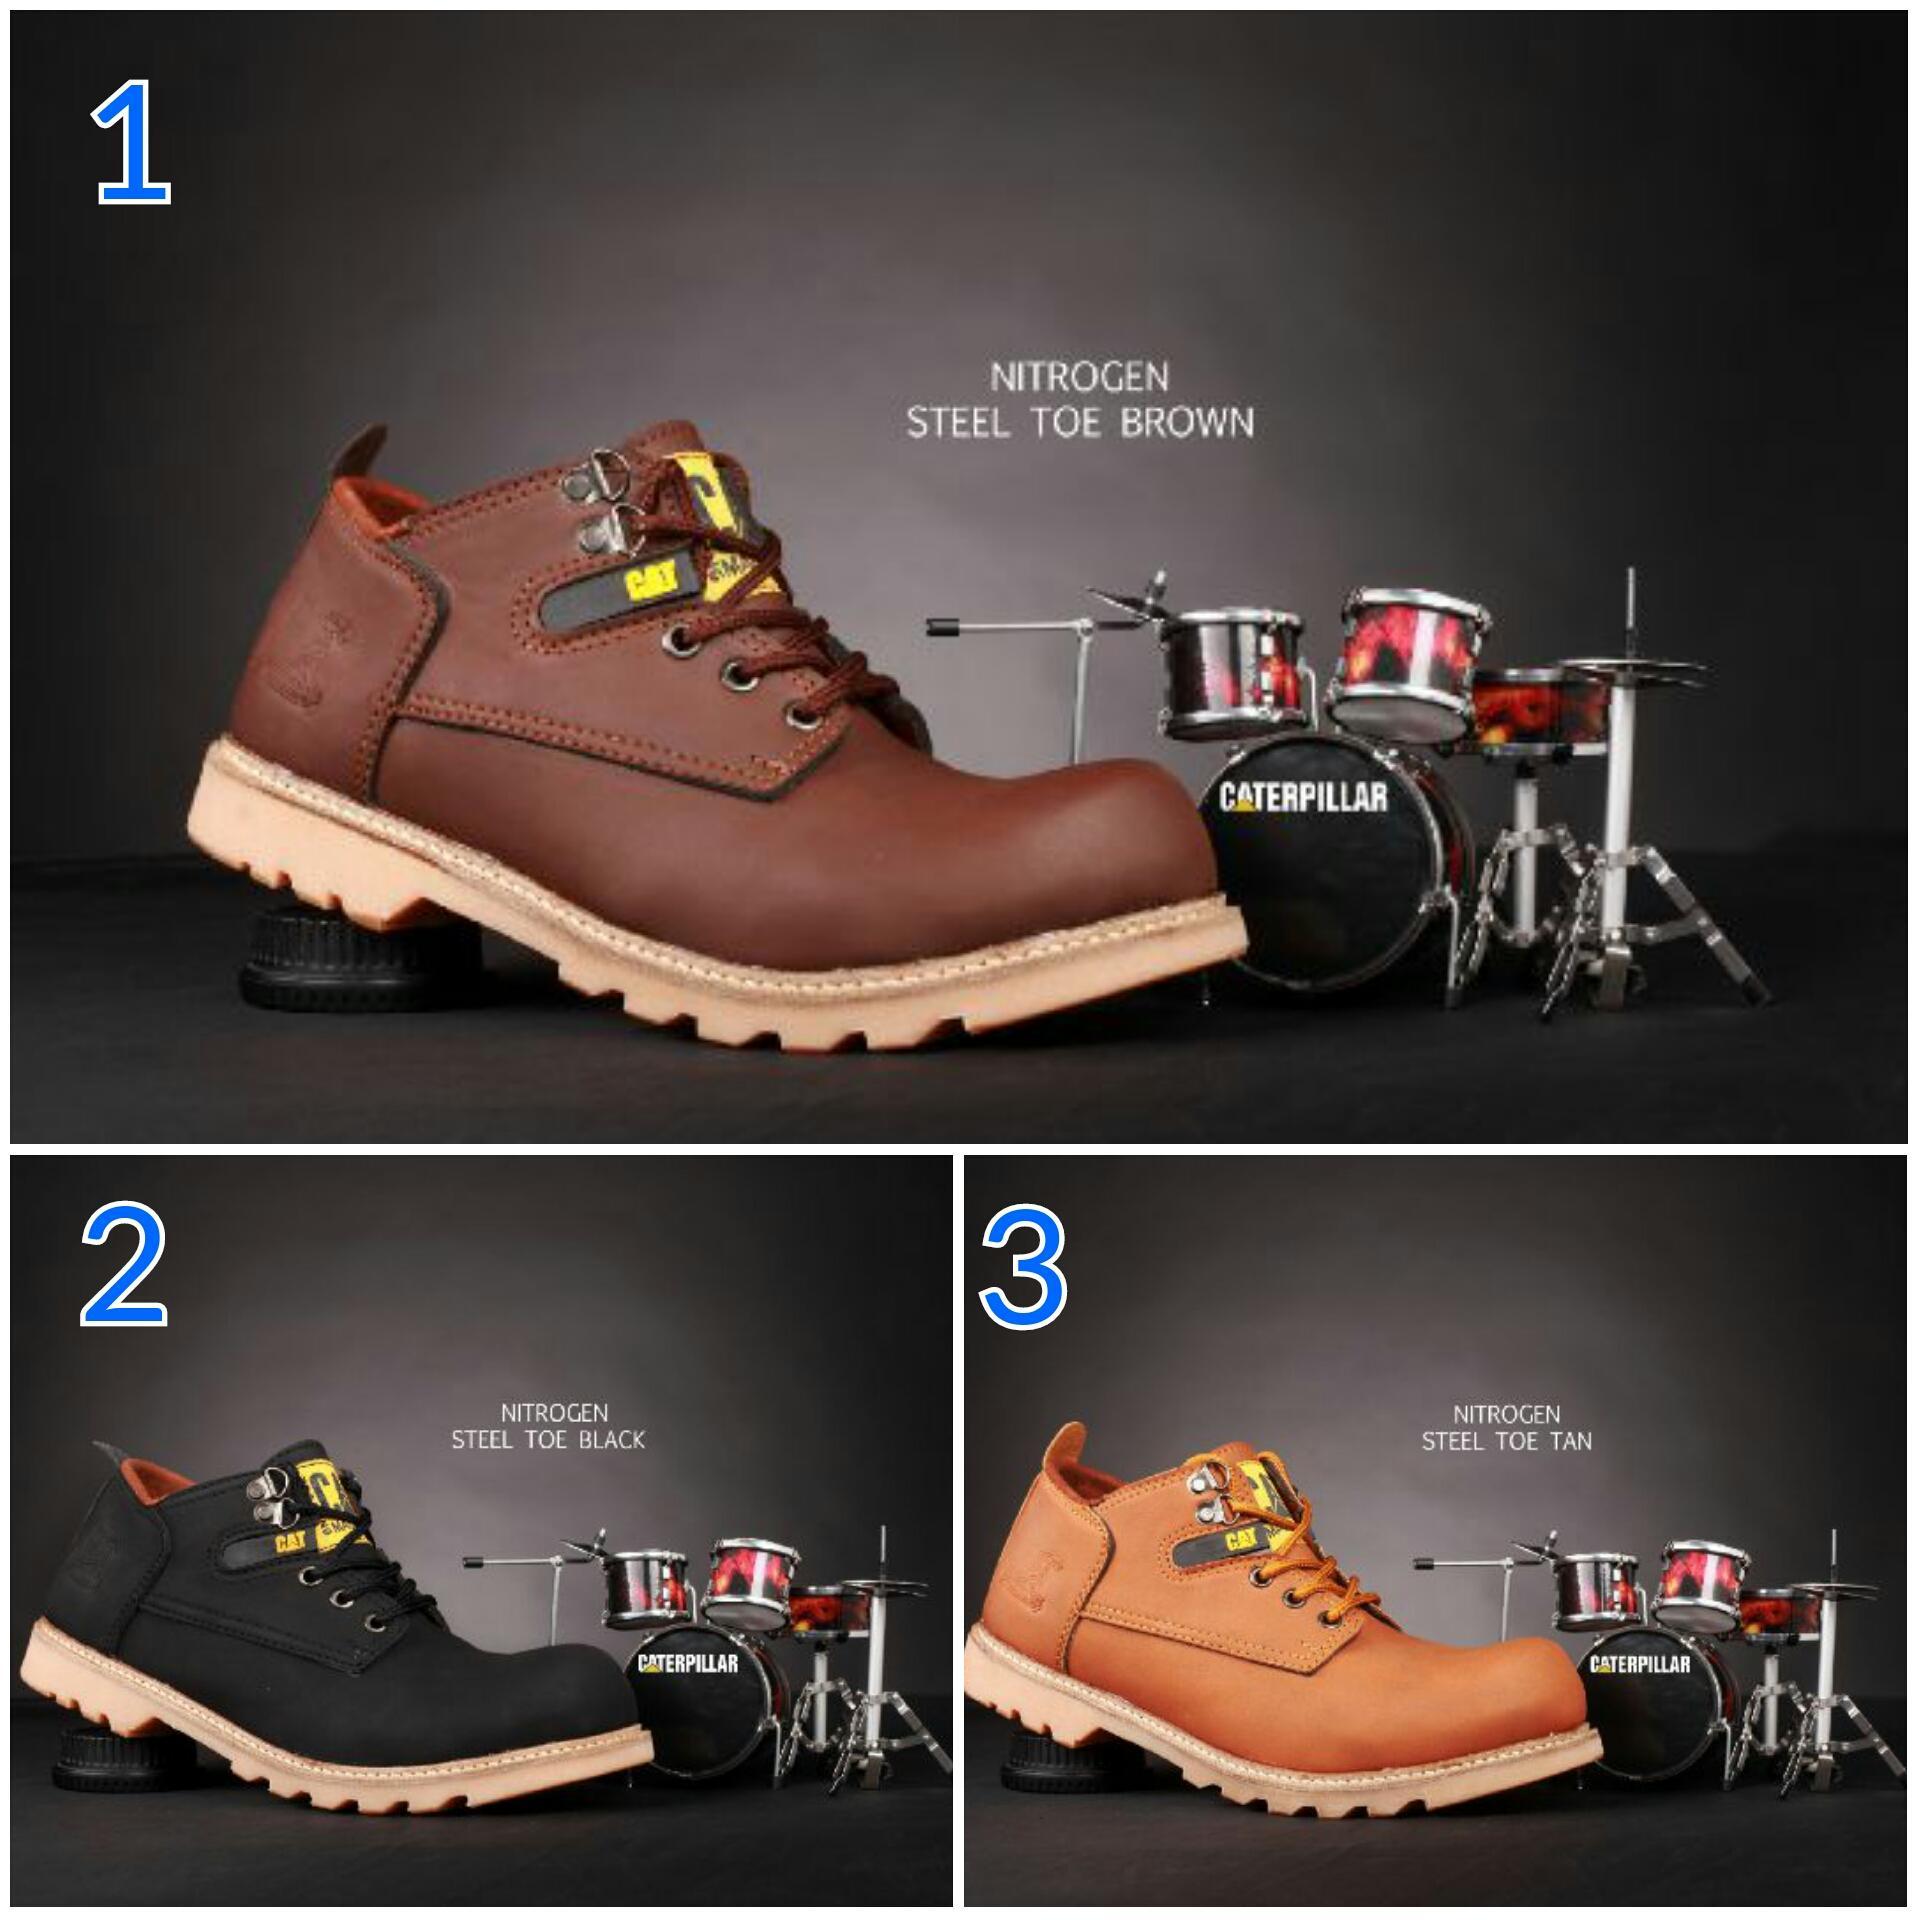 Sepatu Caterpillar Nitrogen Steel Toe Sepatu Pria Original